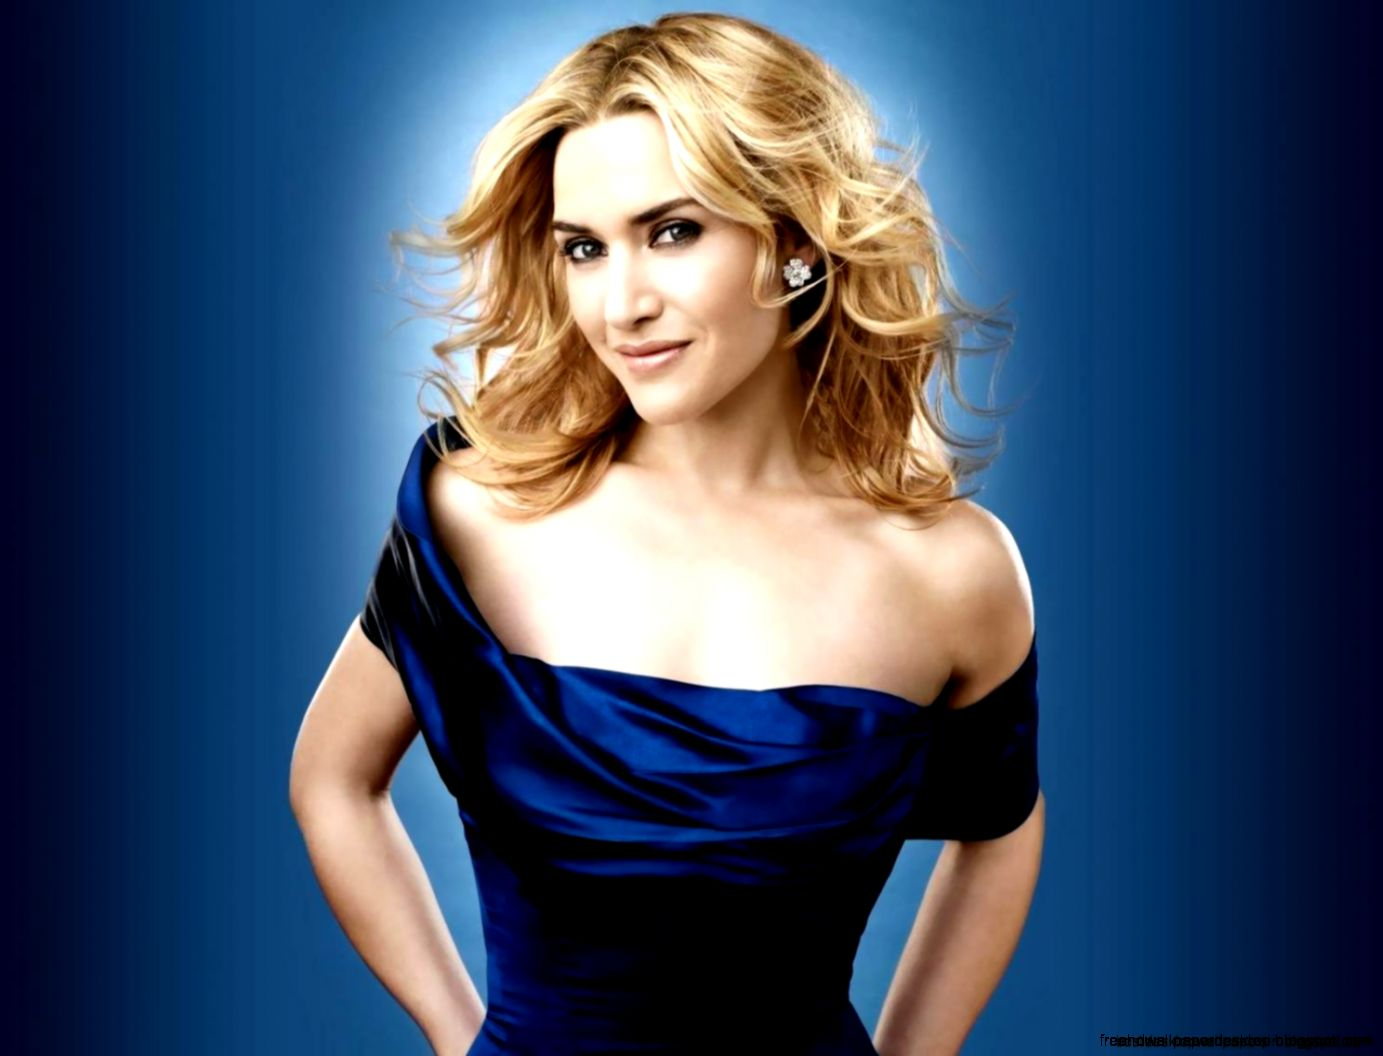 Kate Winslet Actress Woman Hd Wallpaper  Best Desktop Wallpapers